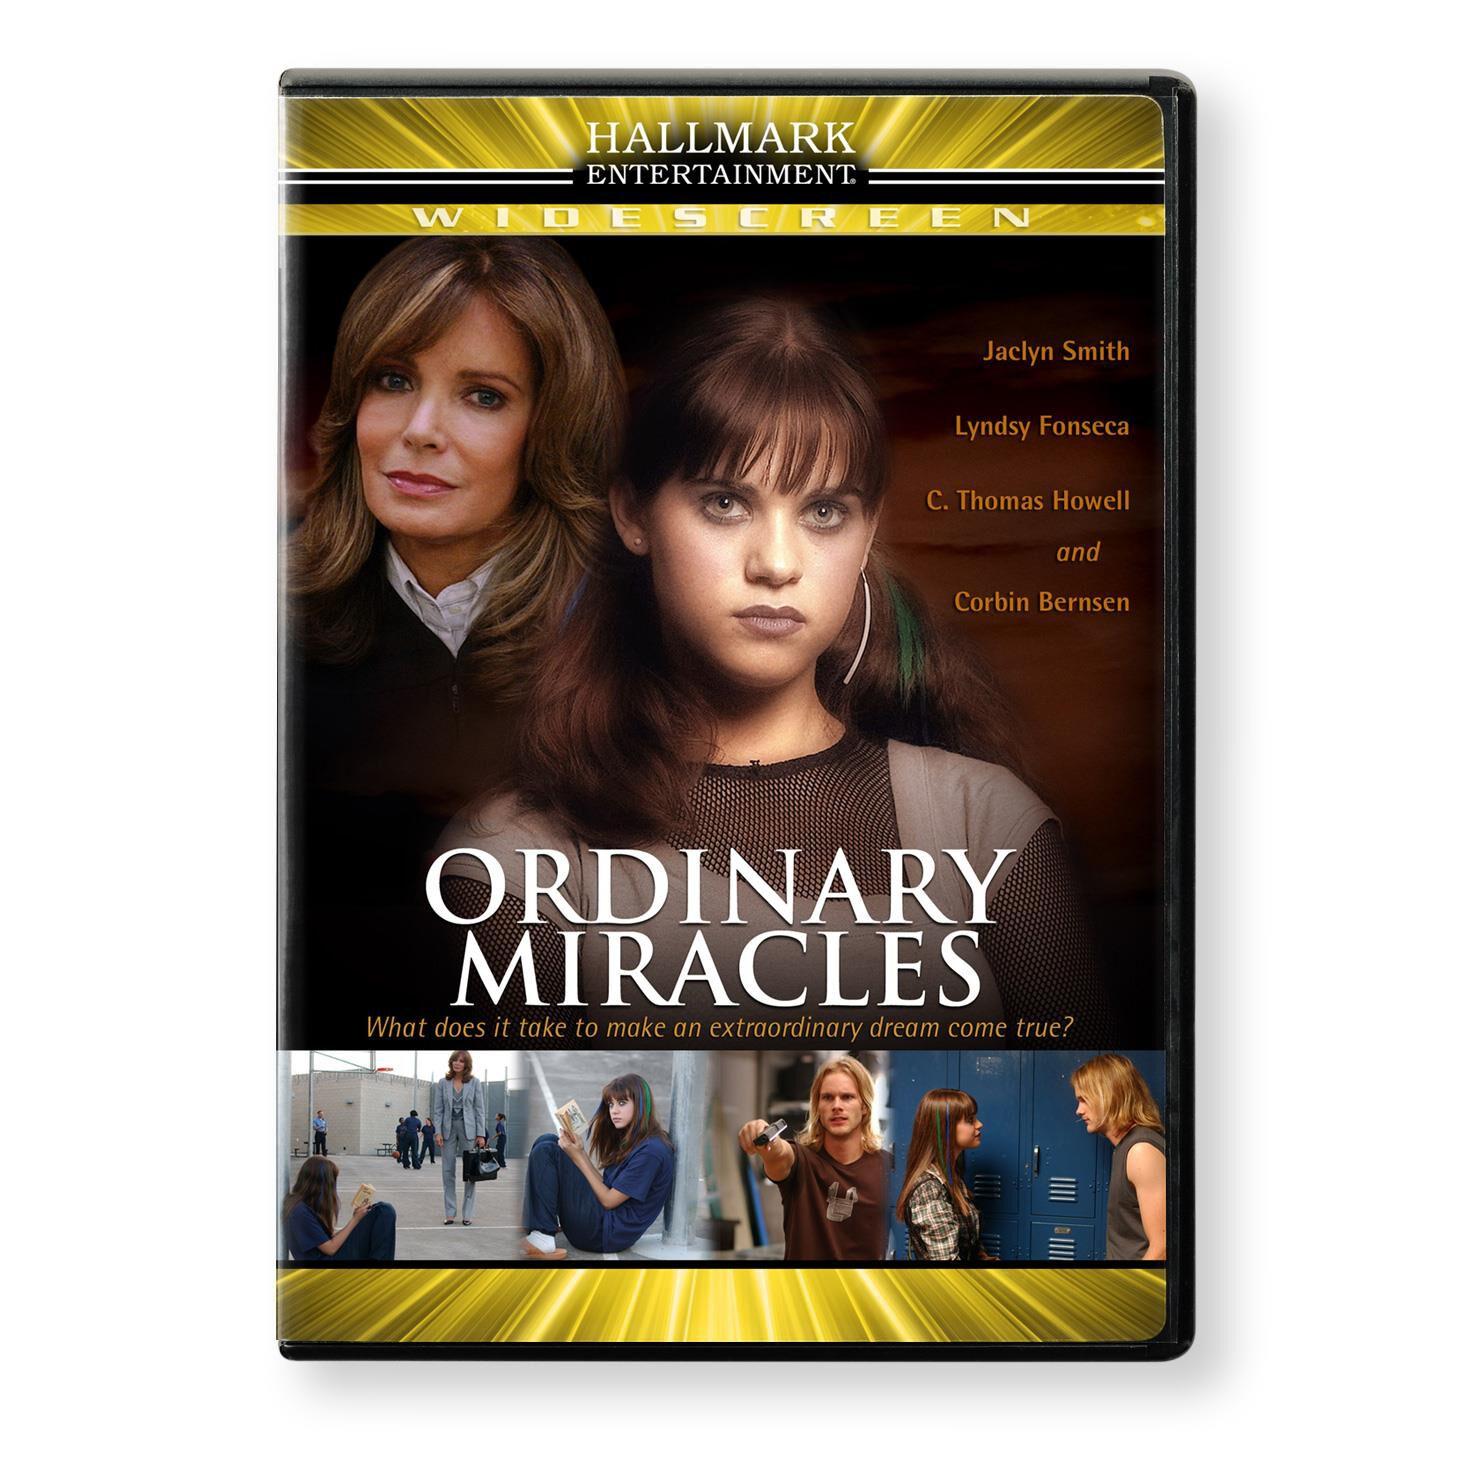 Ordinary Miracles Hallmark Channel Movie Dvd Hallmark